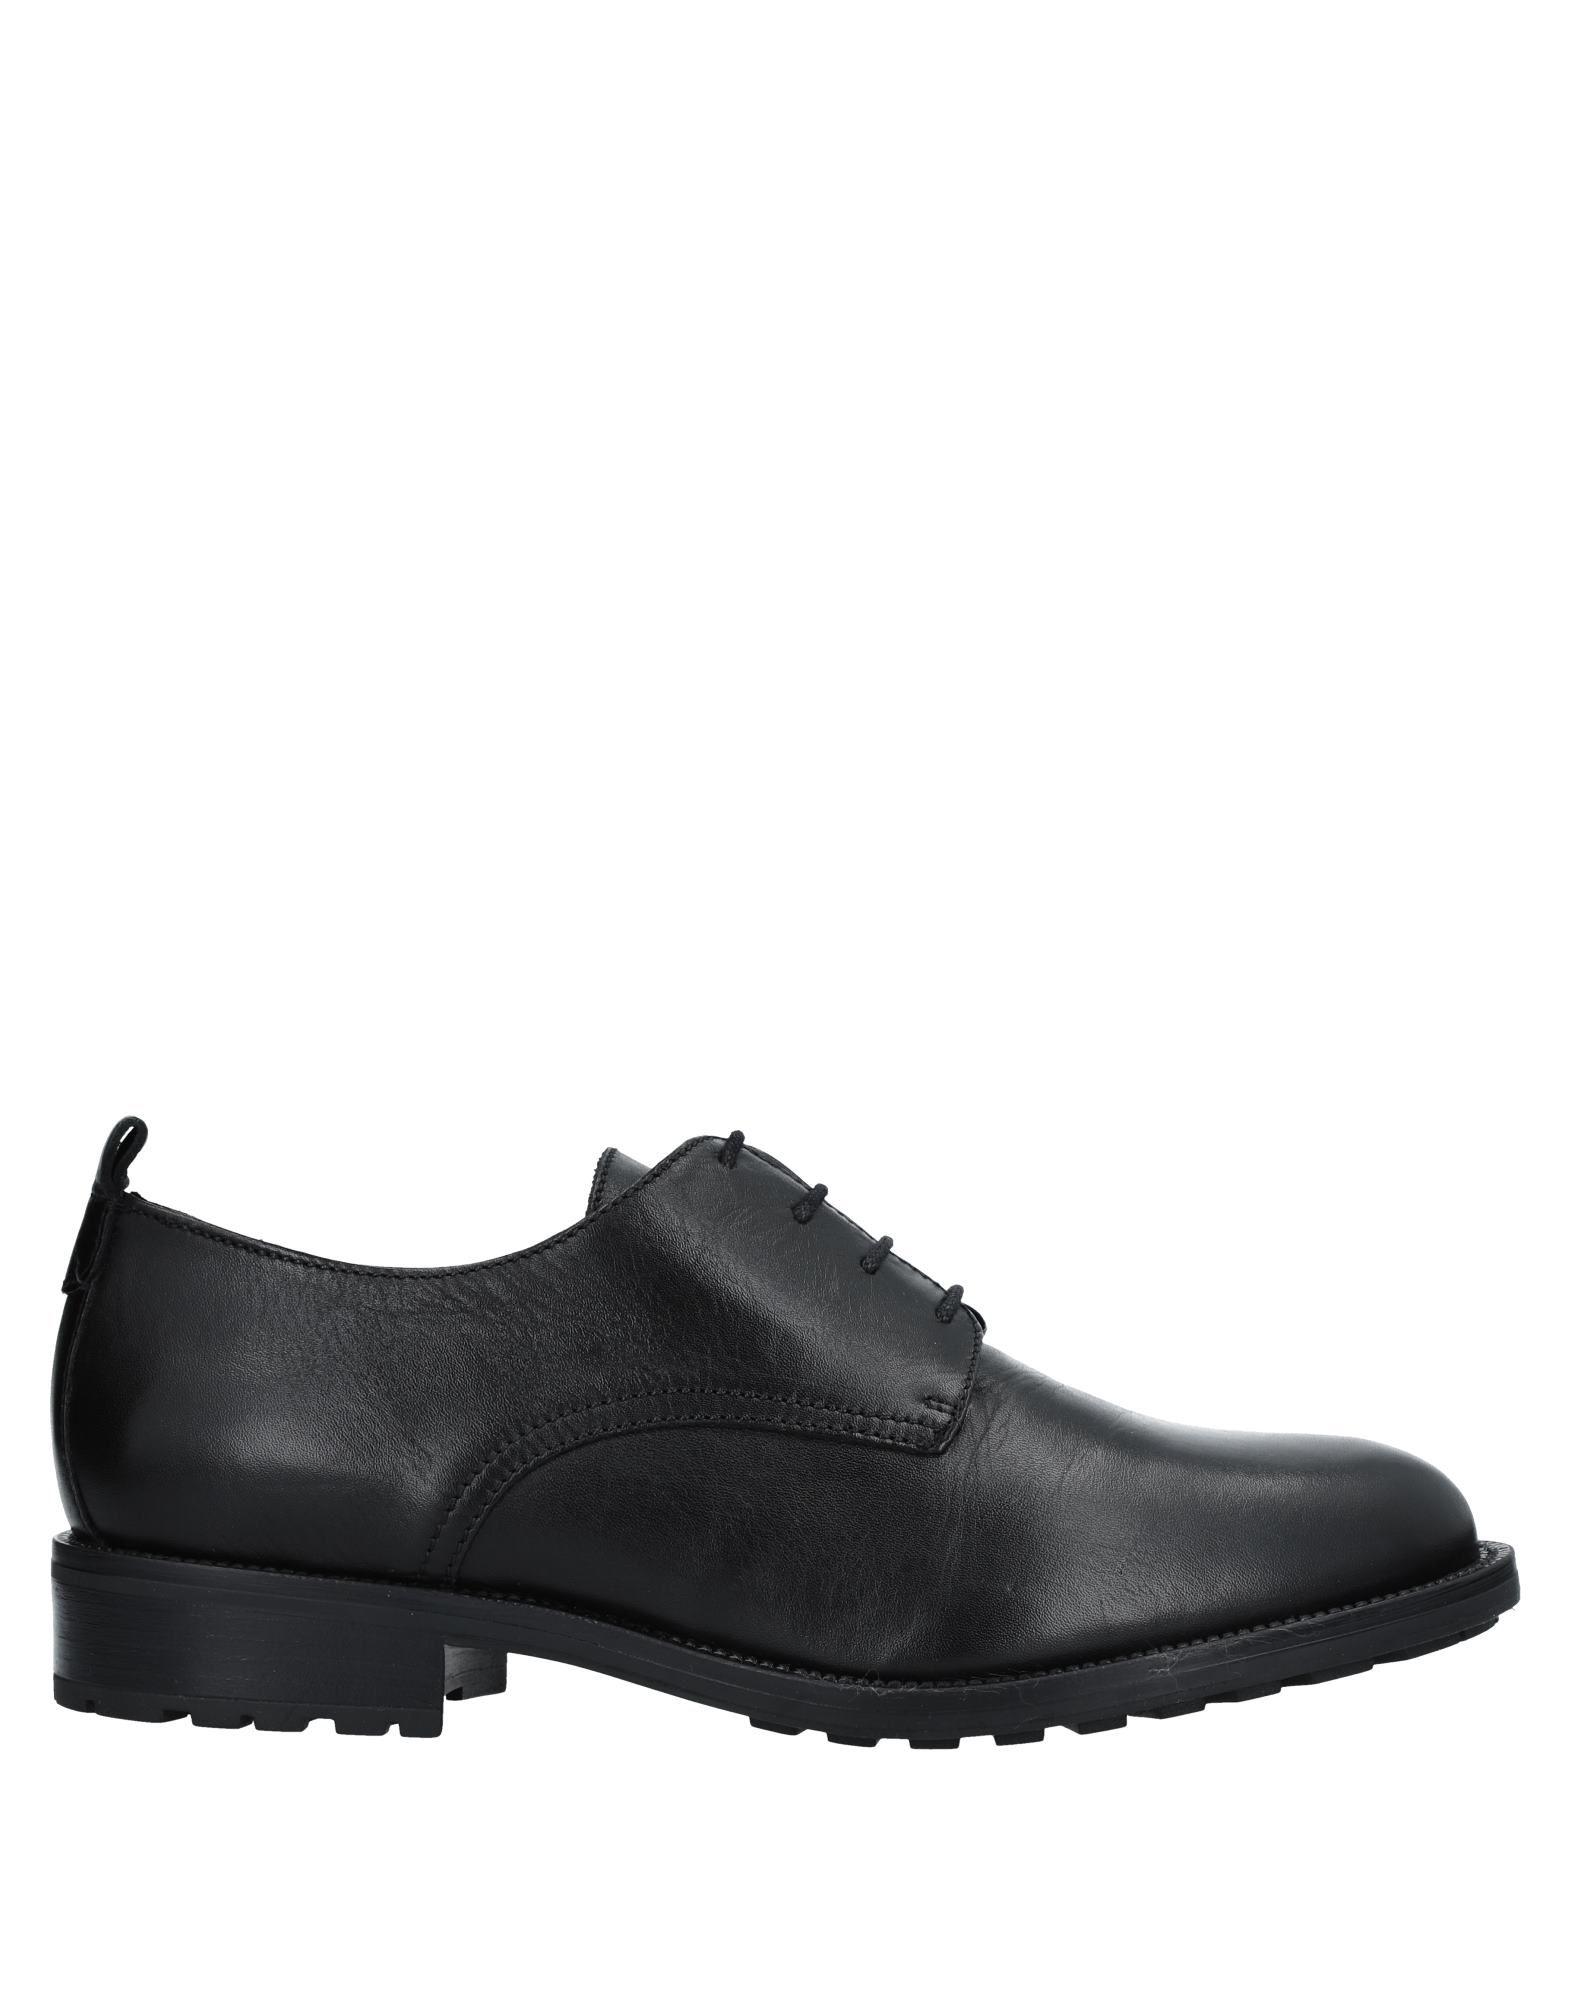 Фото - CARMENS Обувь на шнурках обувь на высокой платформе dkny